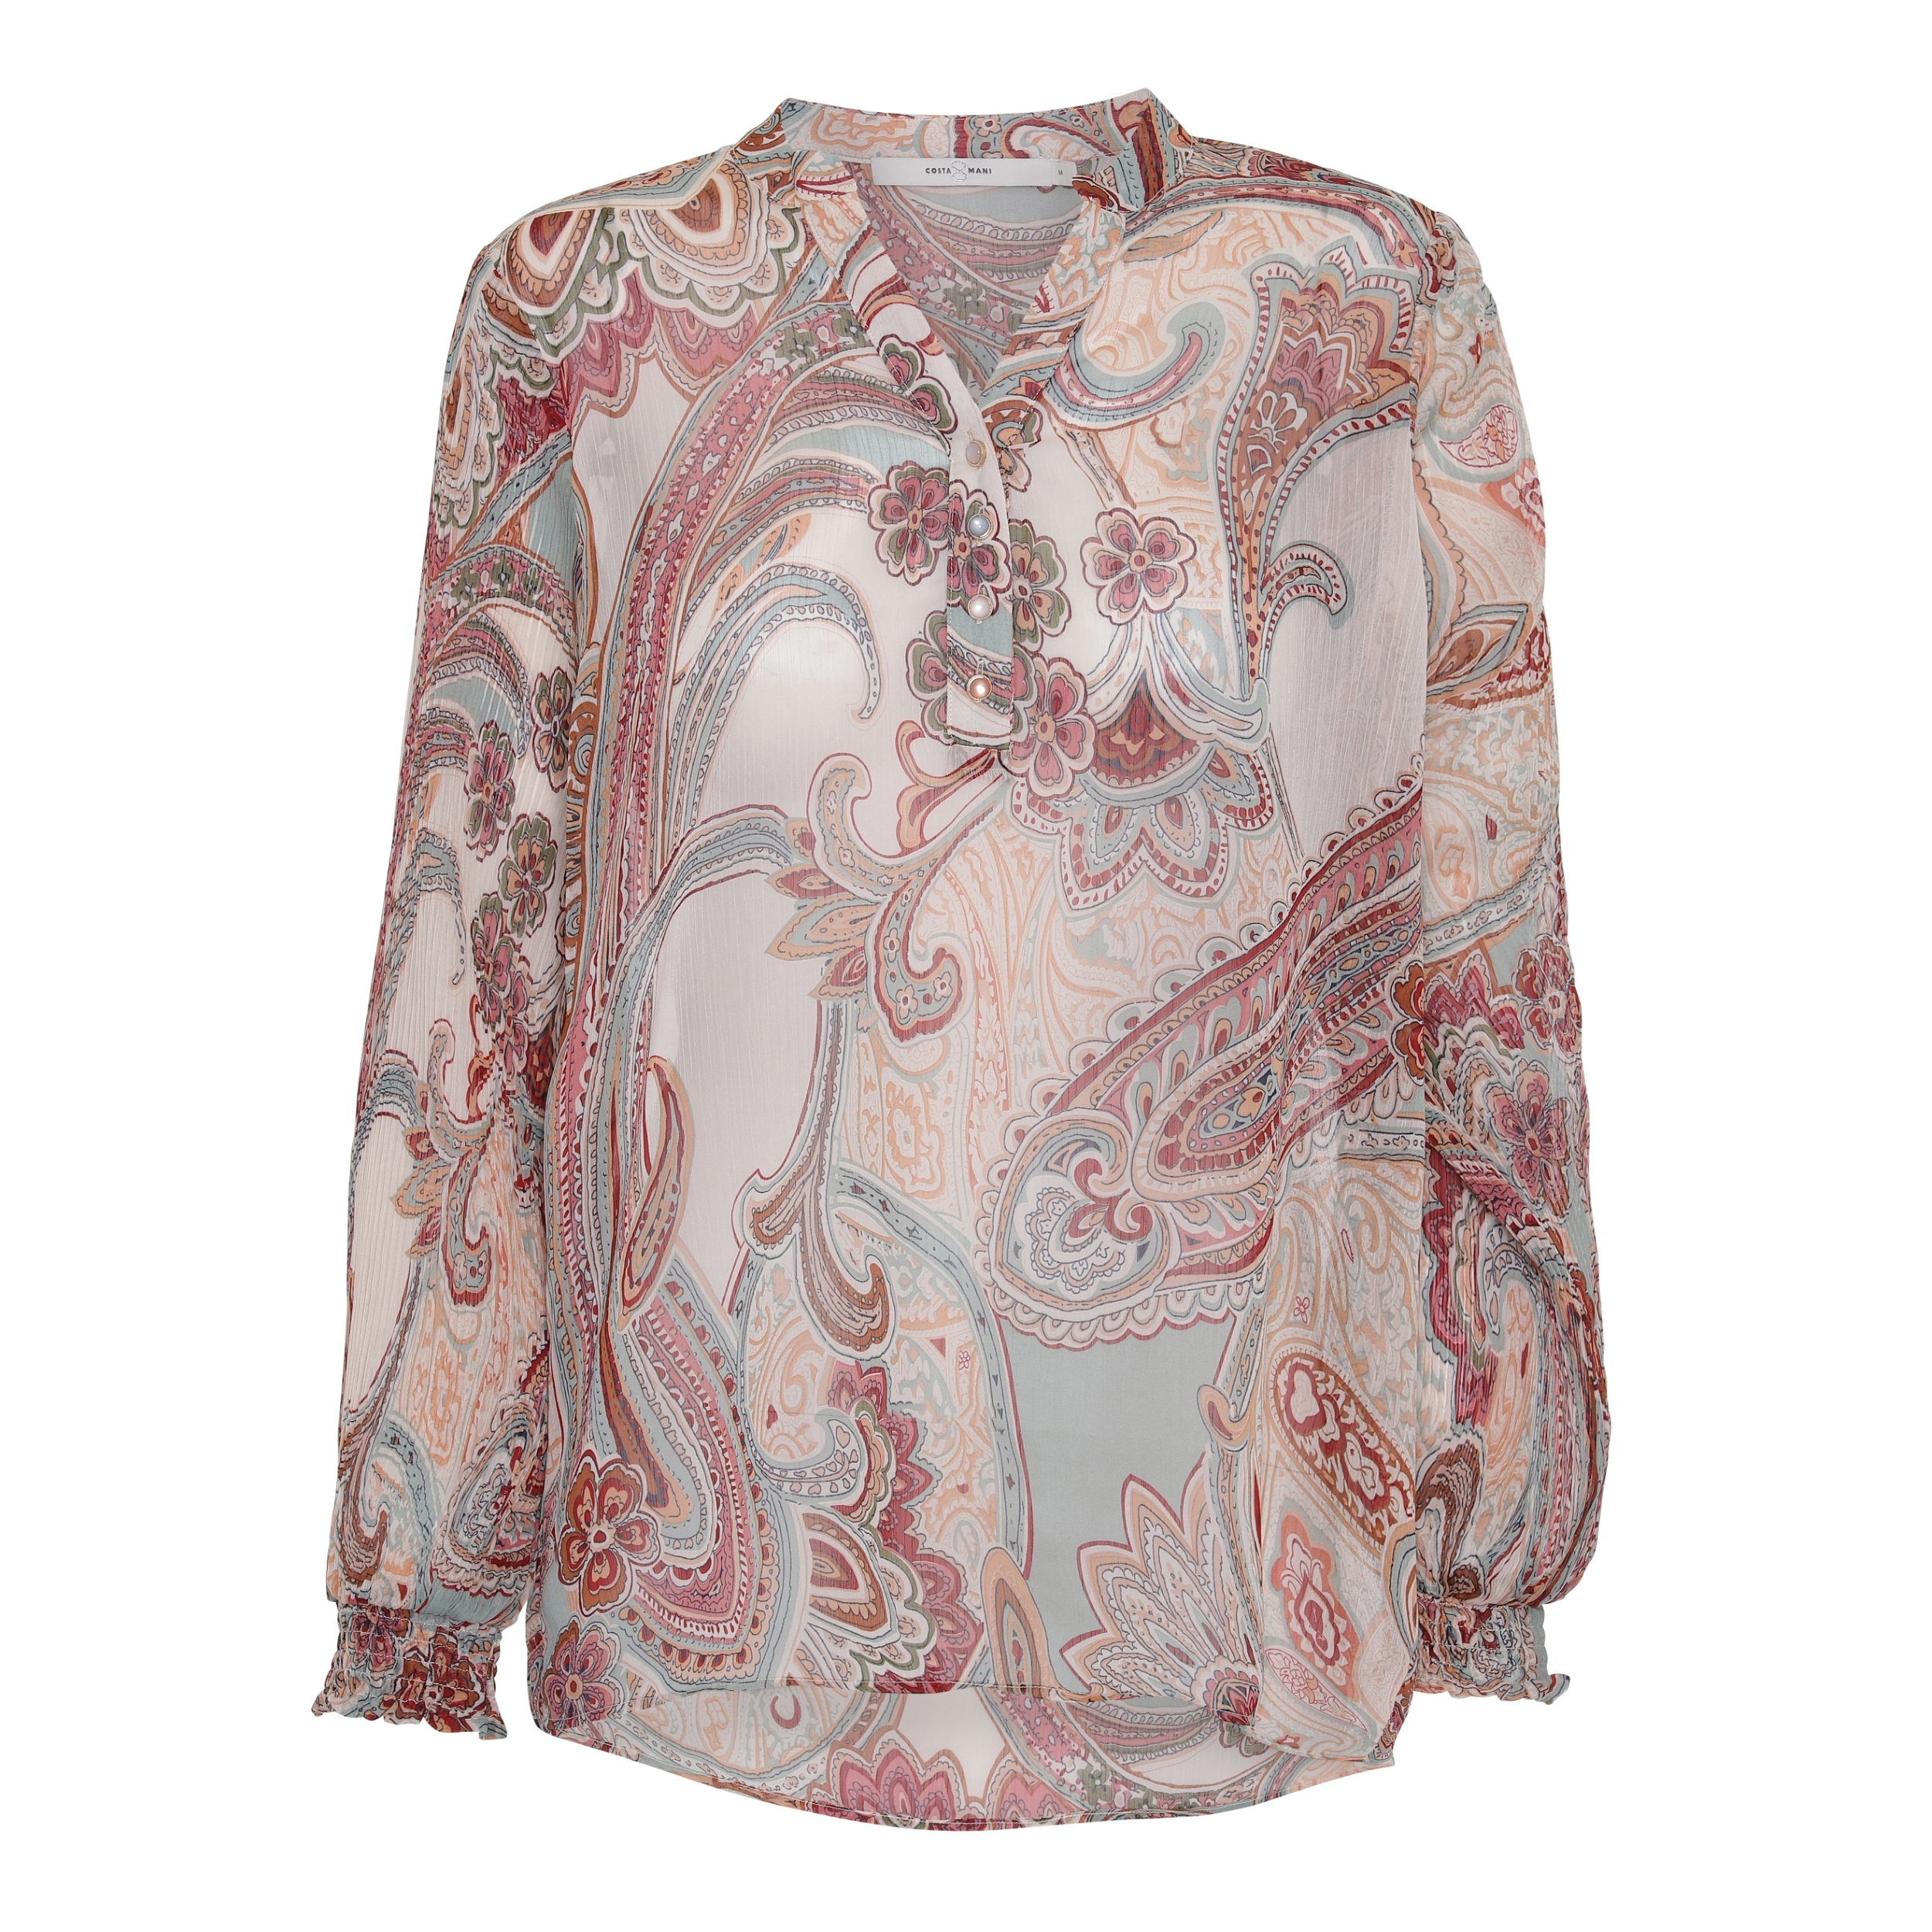 Costamani - Aura shirt